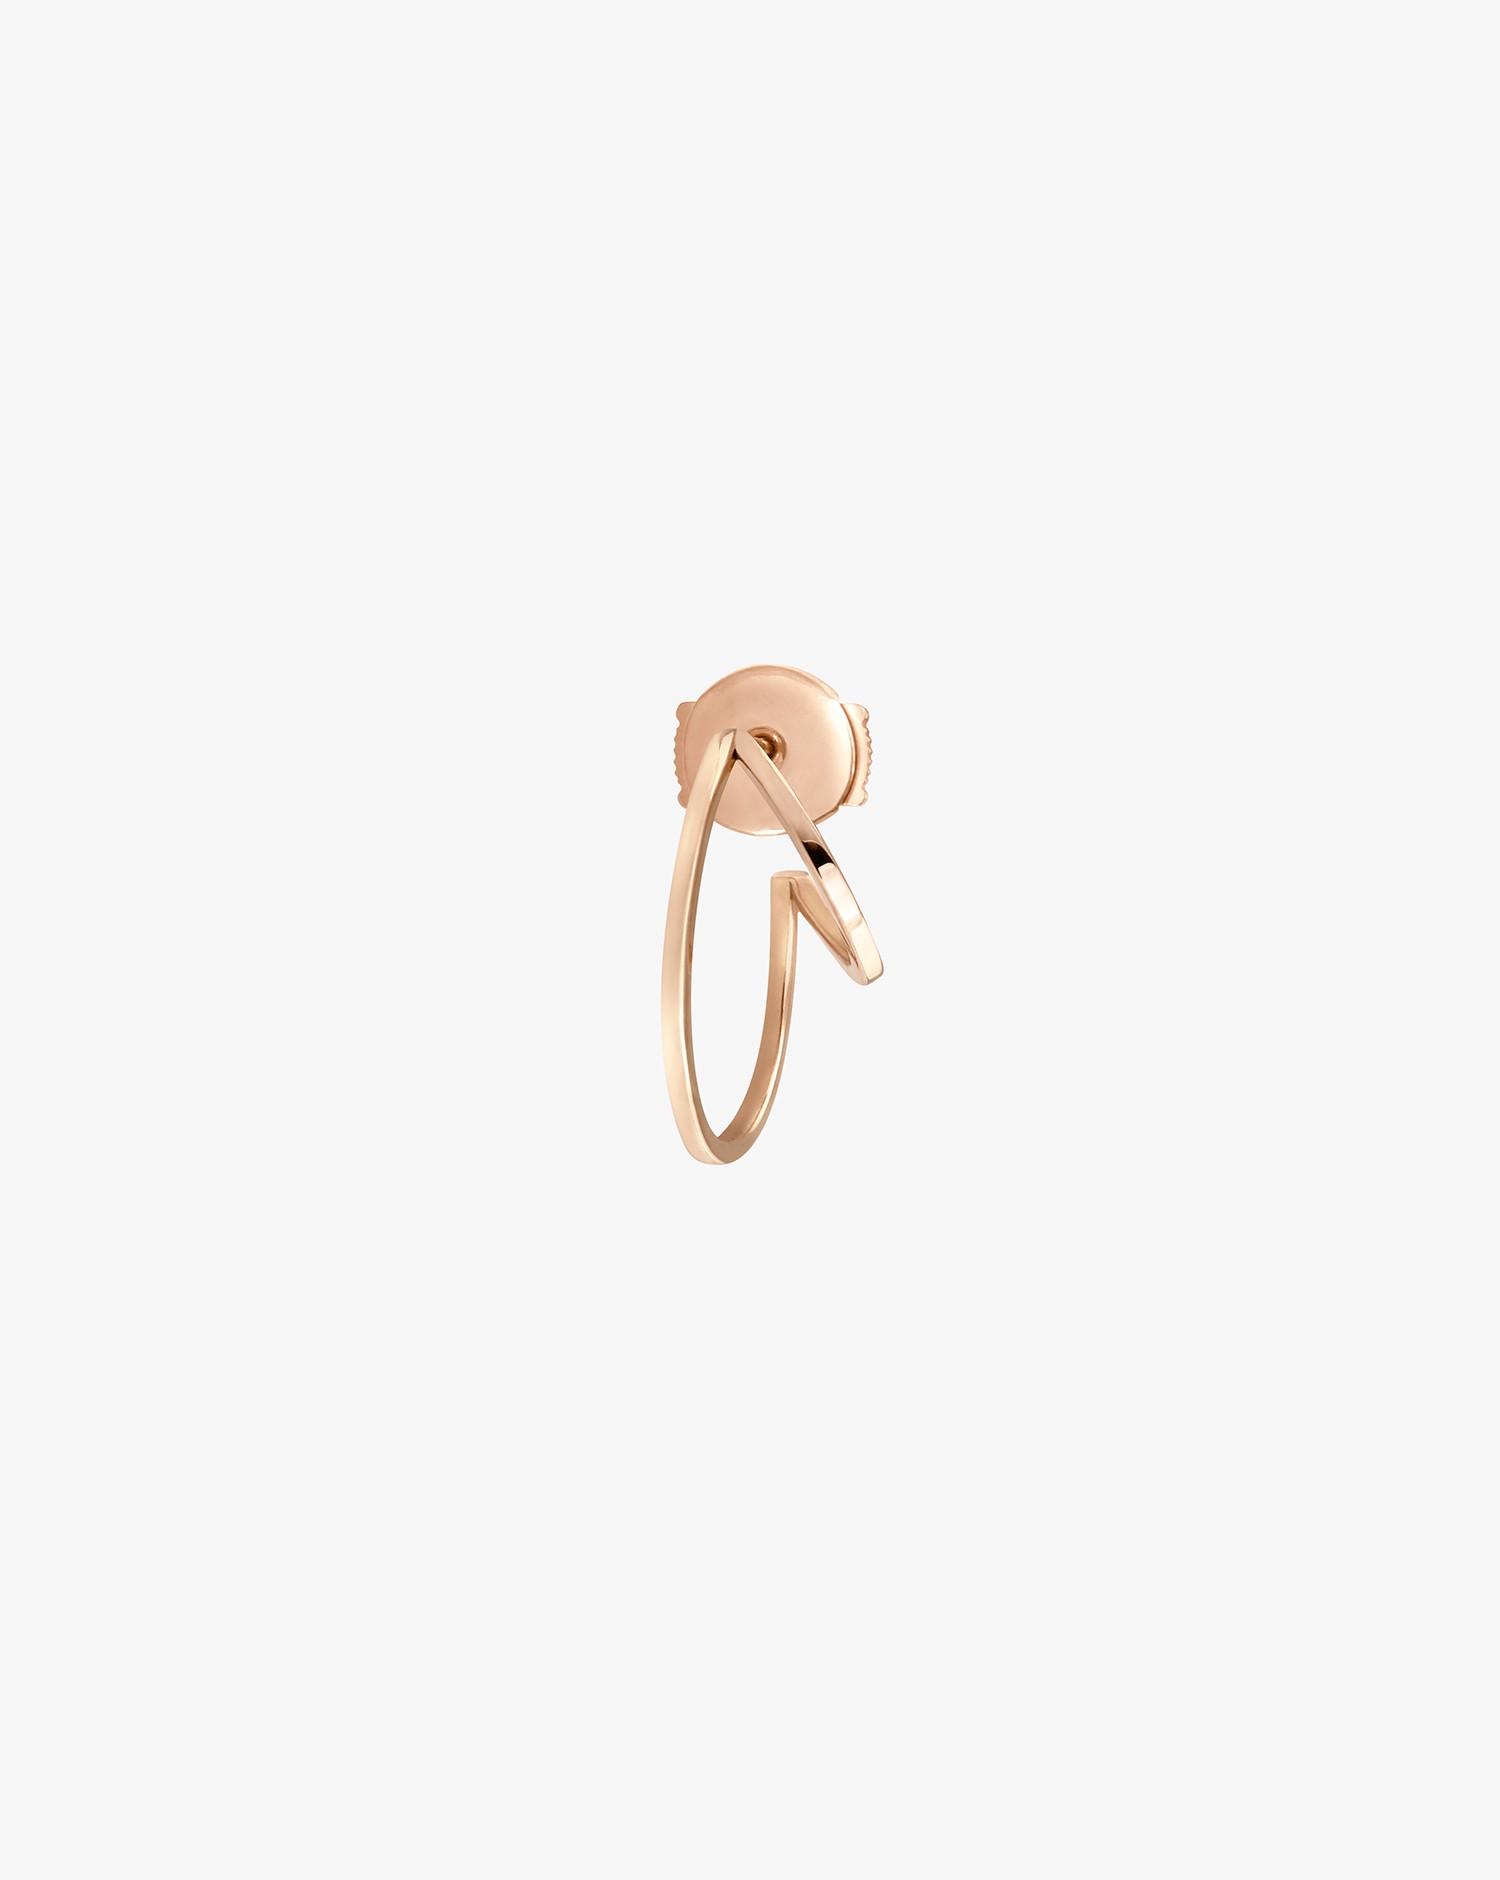 Ohrringe Styloide 18ct Gold - vanrycke - OS3R0-04